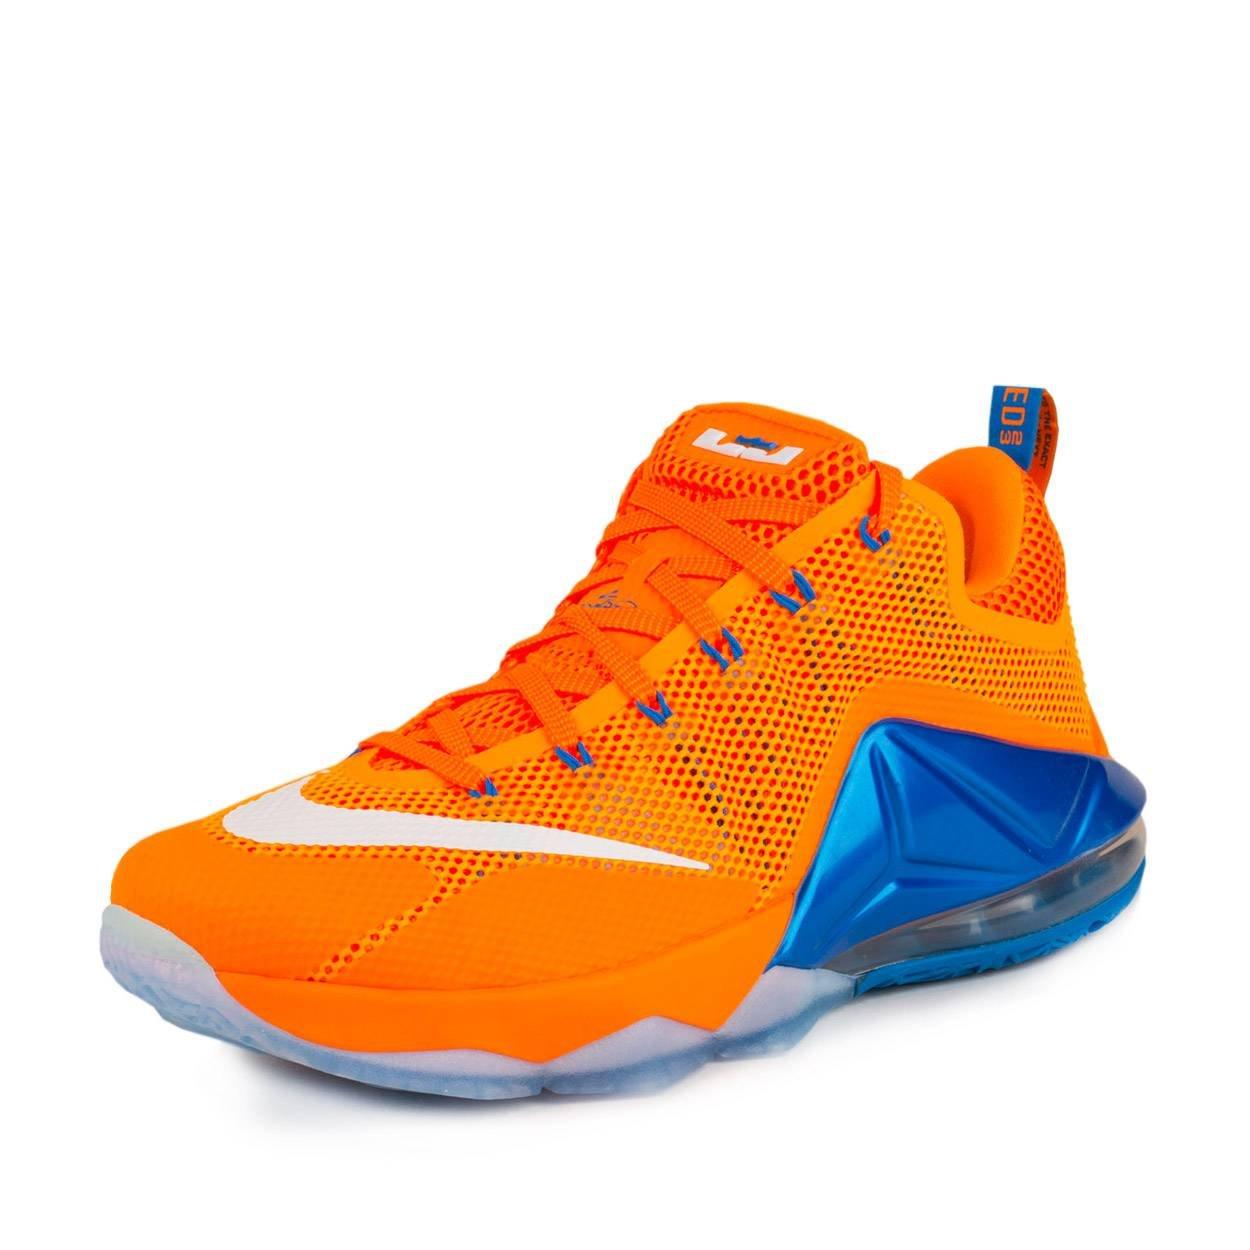 sale retailer c9059 ed875 Galleon - NIKE Men s Lebron XII Low Basketball Shoe (8)